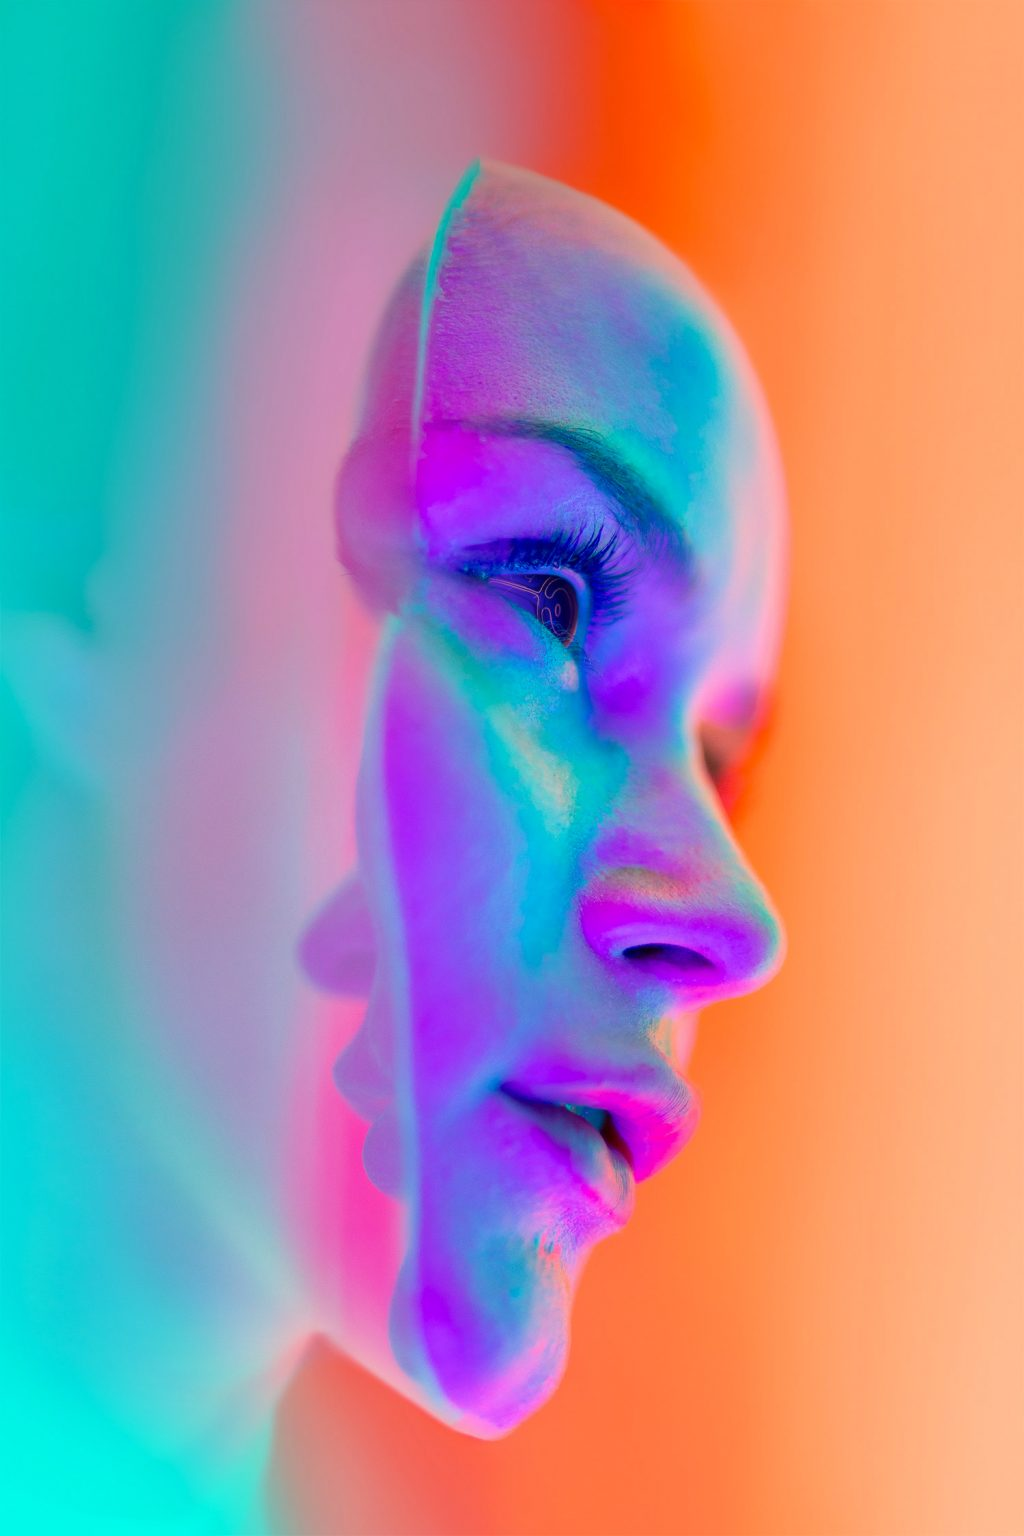 neon glow photography